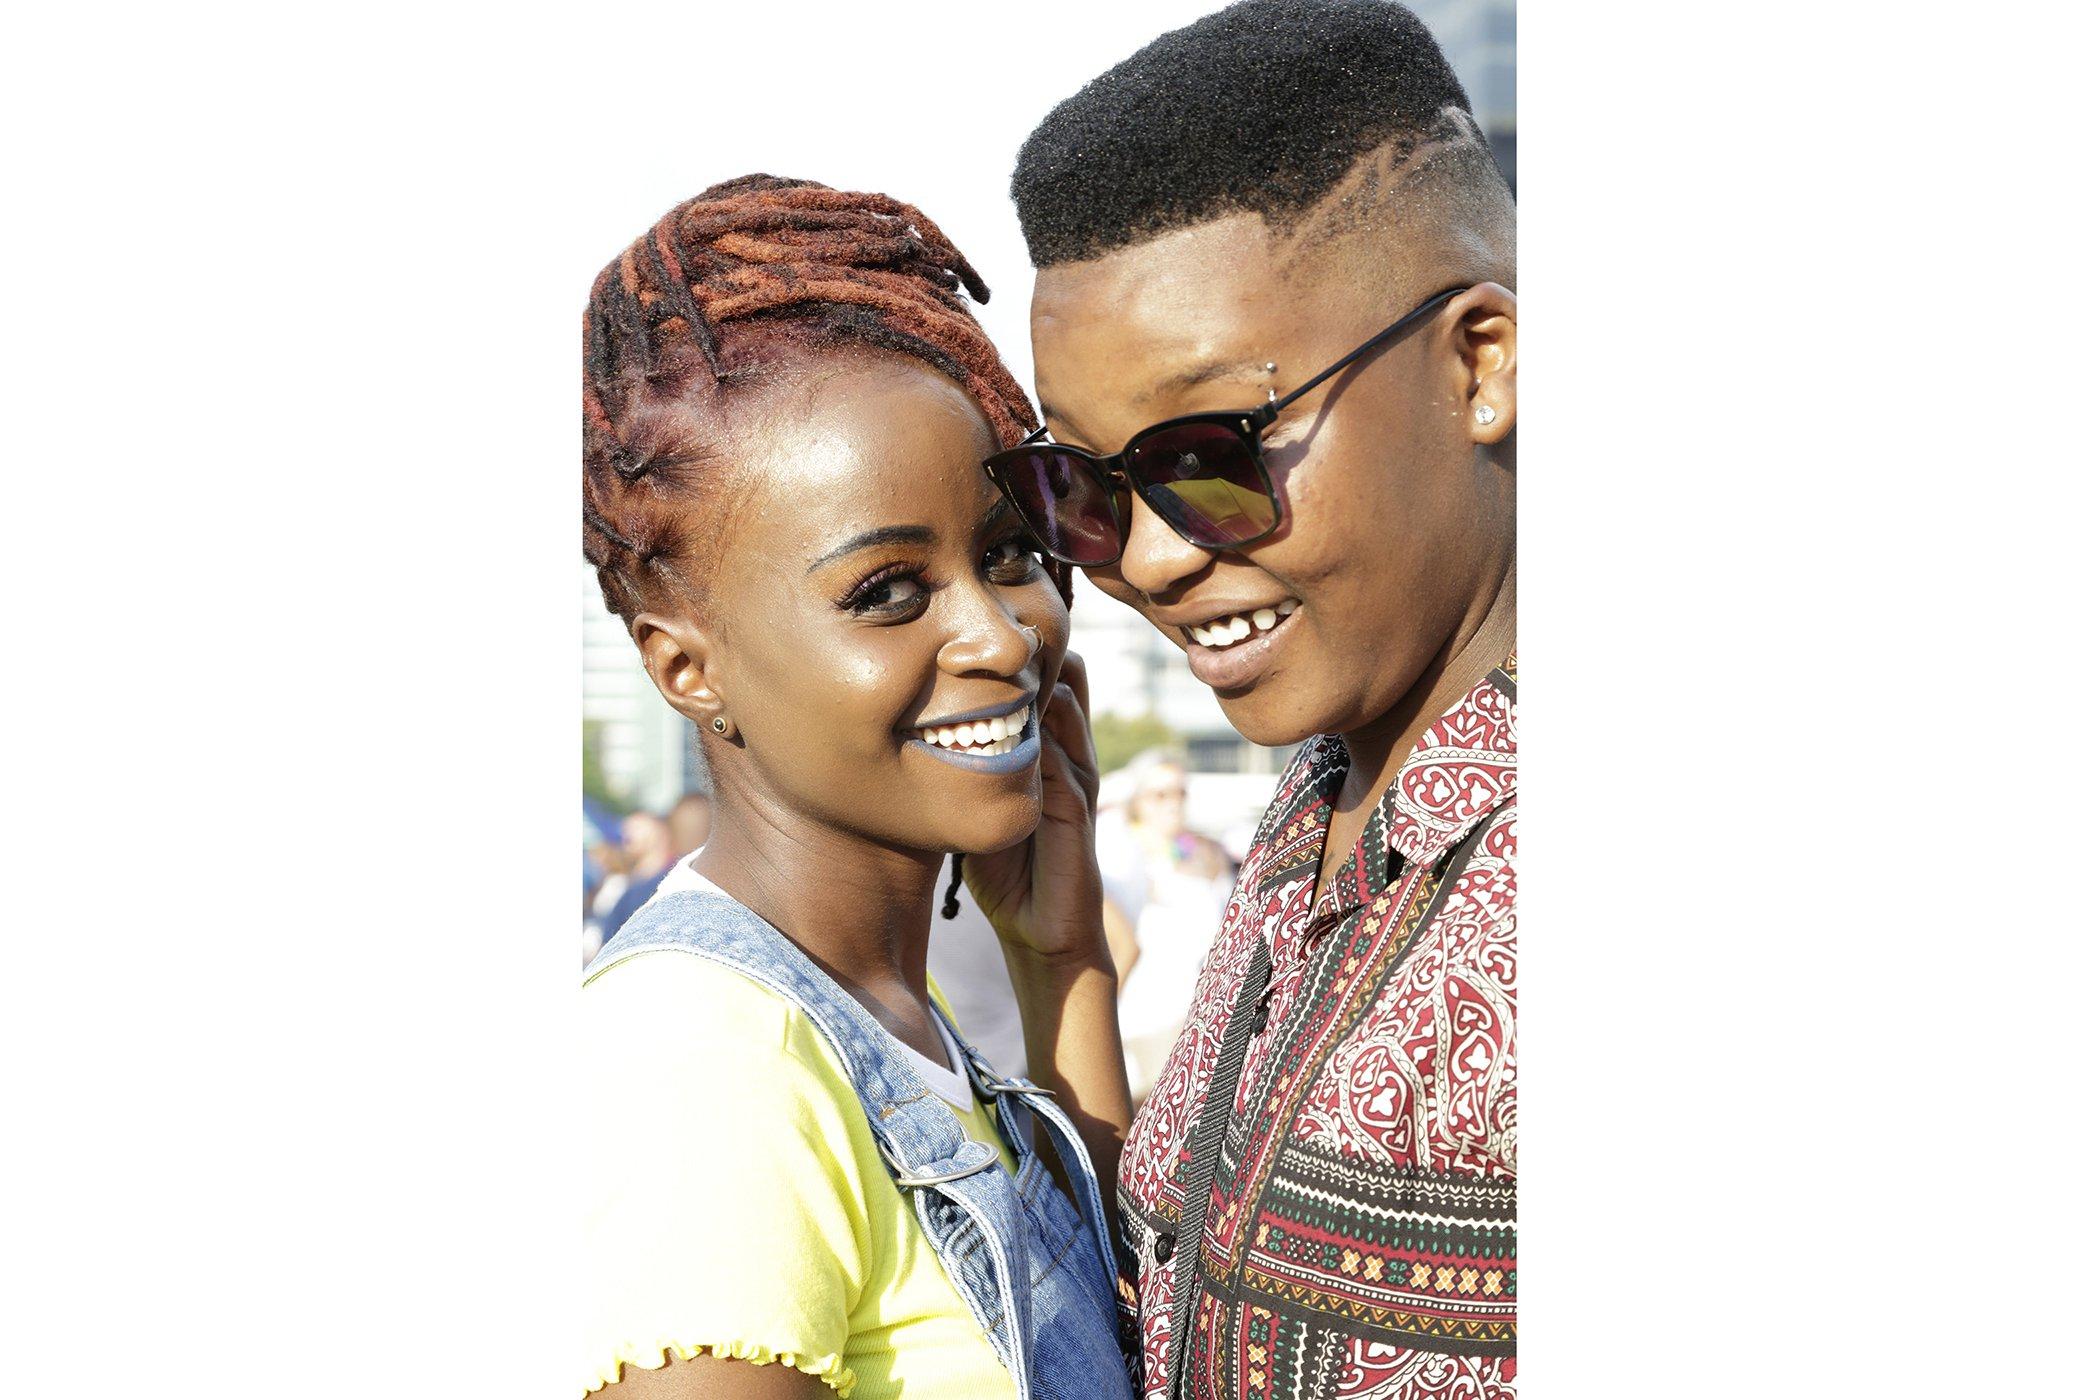 Johannesburg_Pride_LGBTQ_Noncedo Gxekwa_014-FULL.jpg